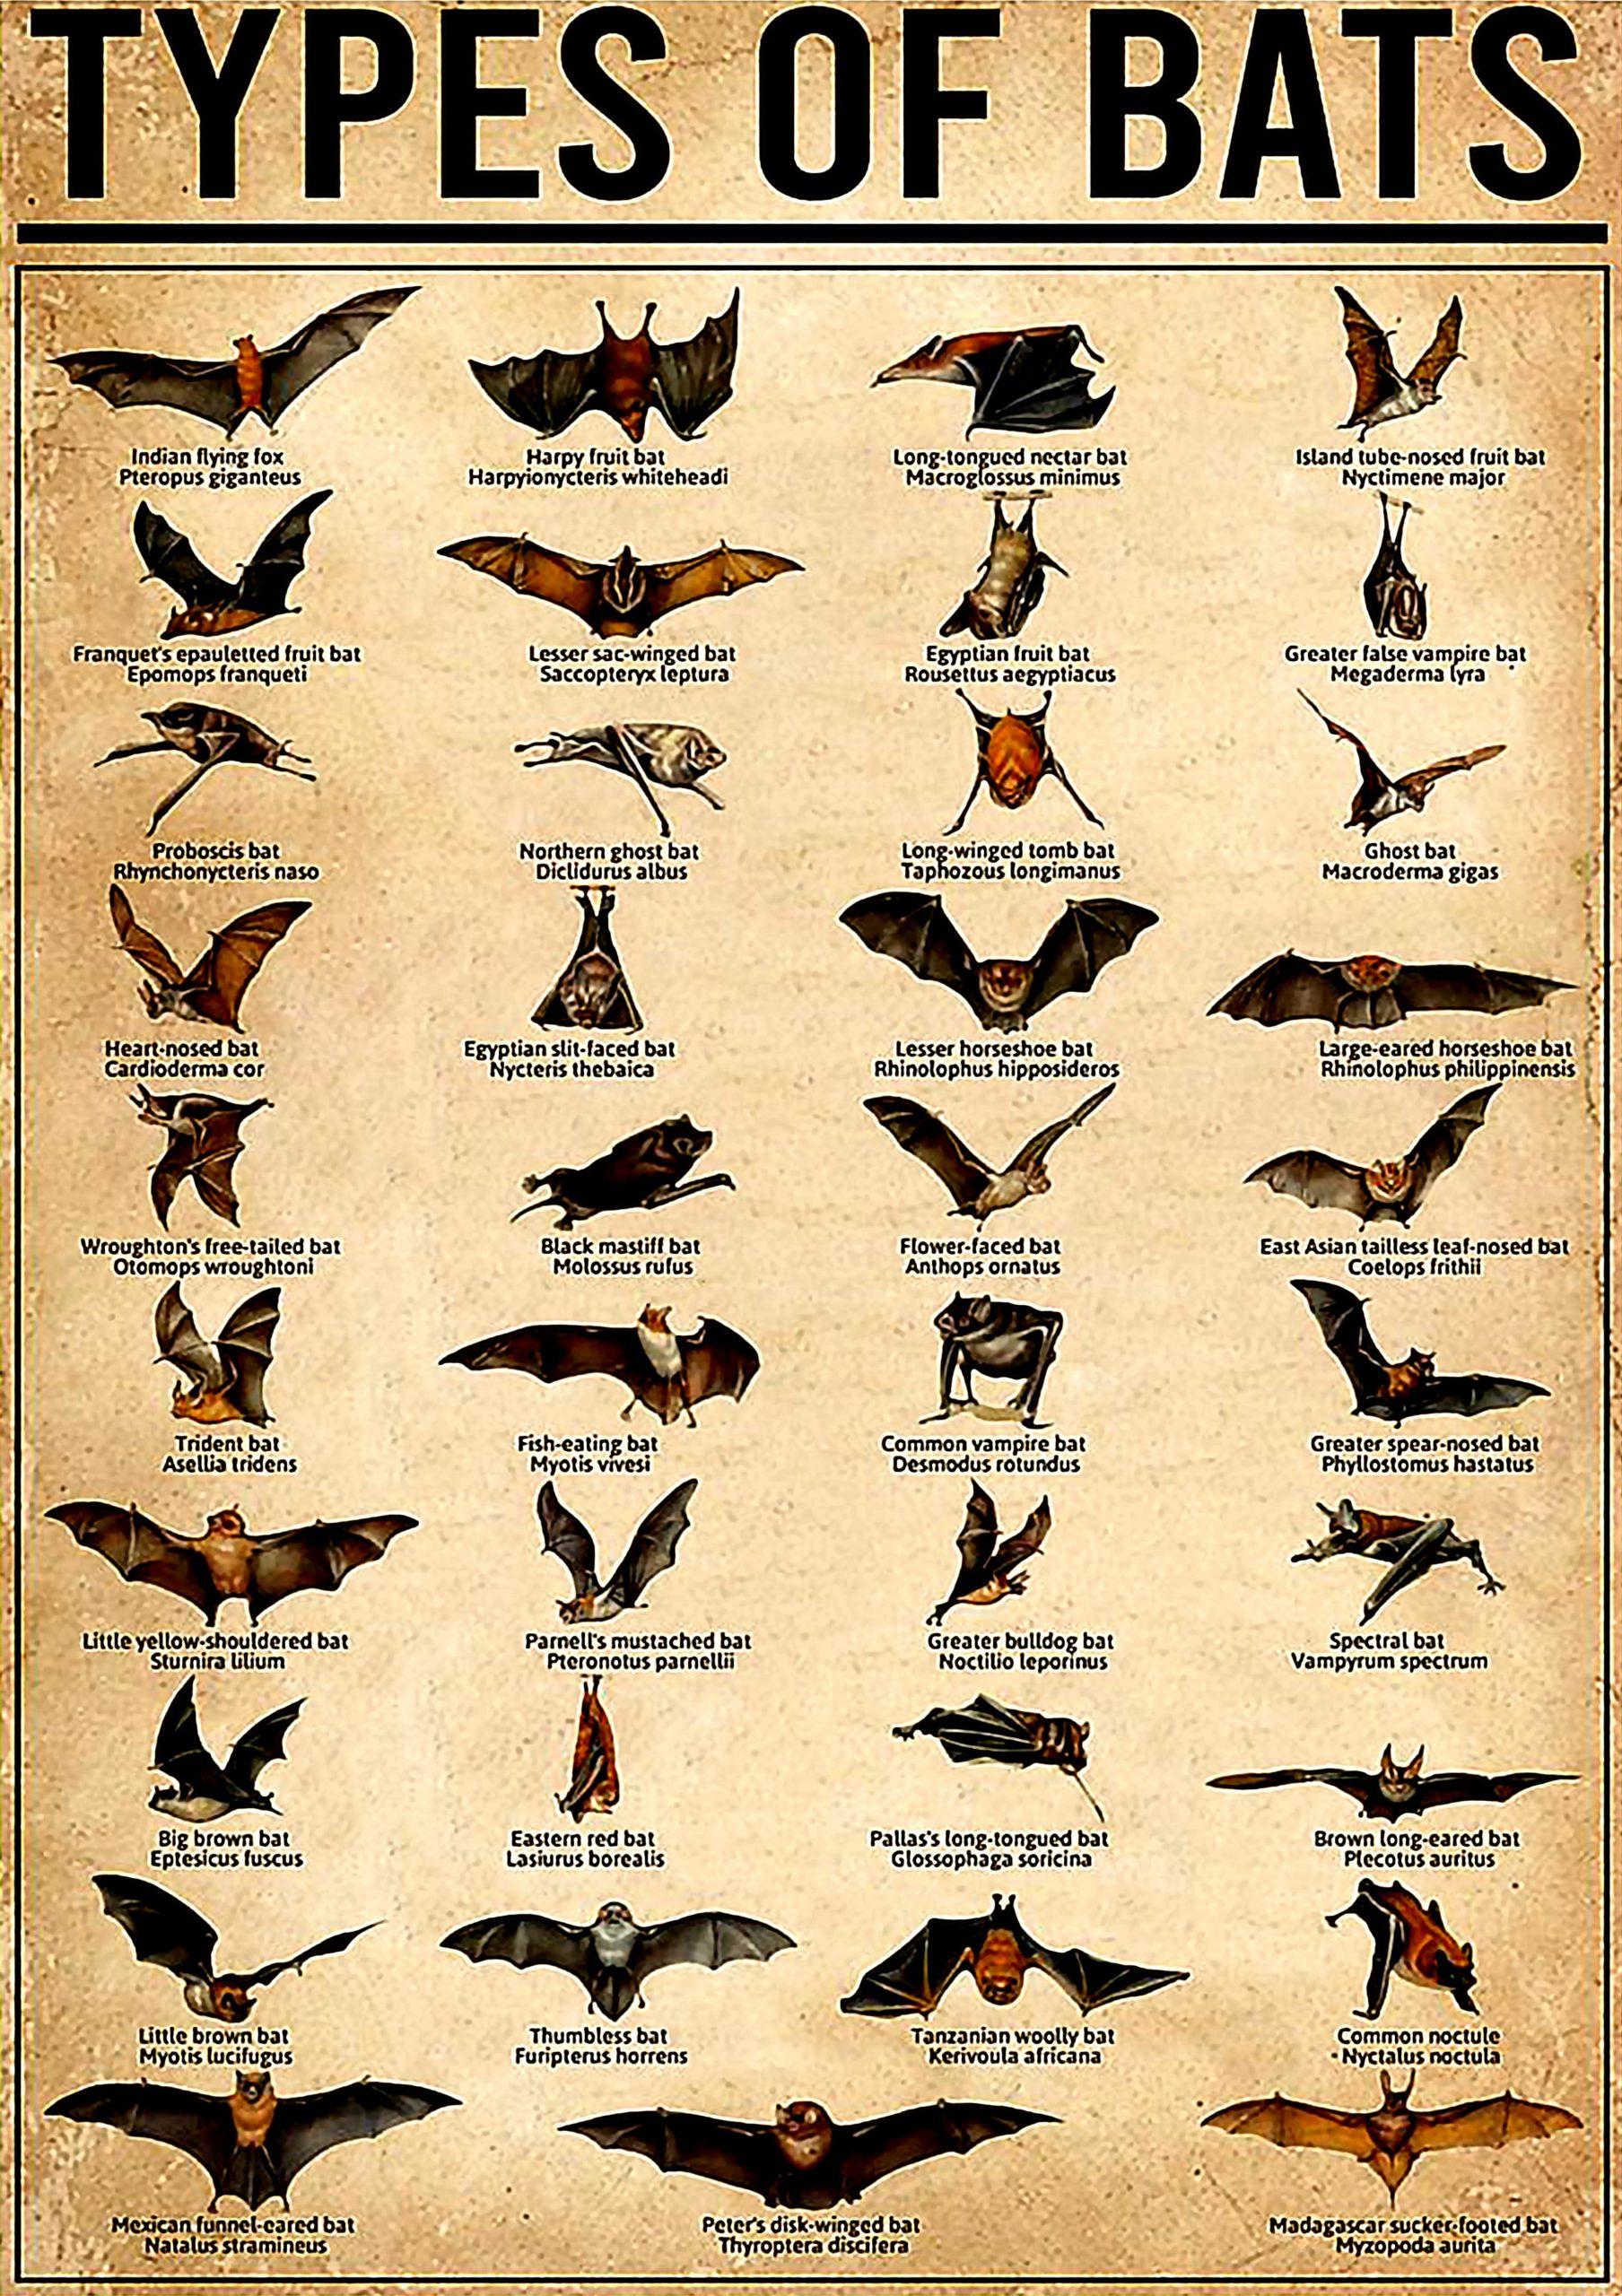 vintage types of bats poster 1